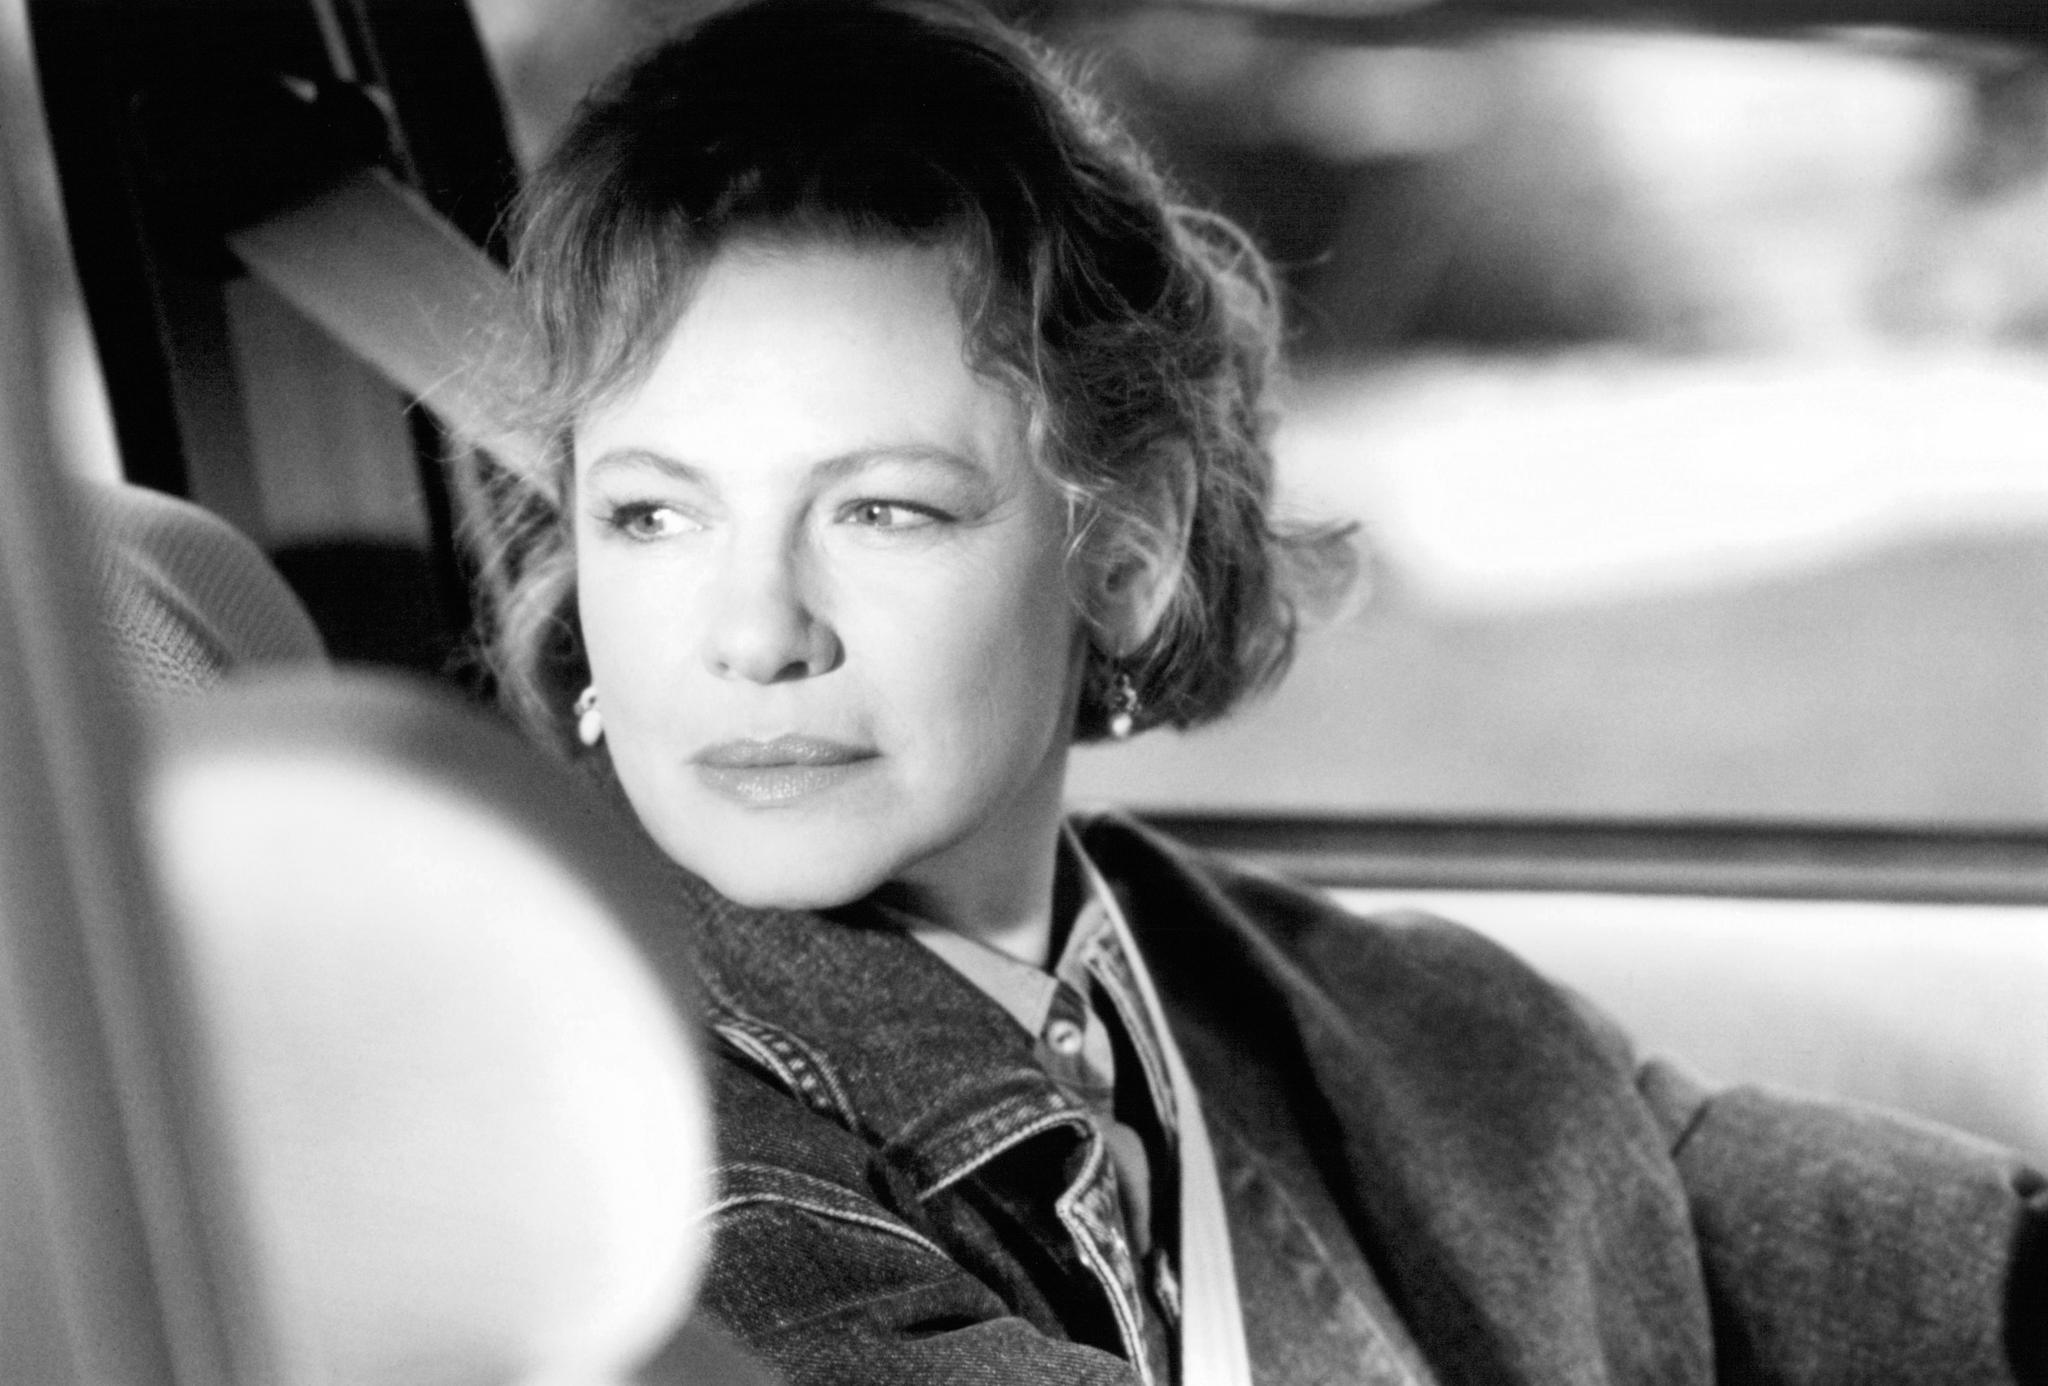 Dianne Wiest, Amerikalı aktris tarihte bugün